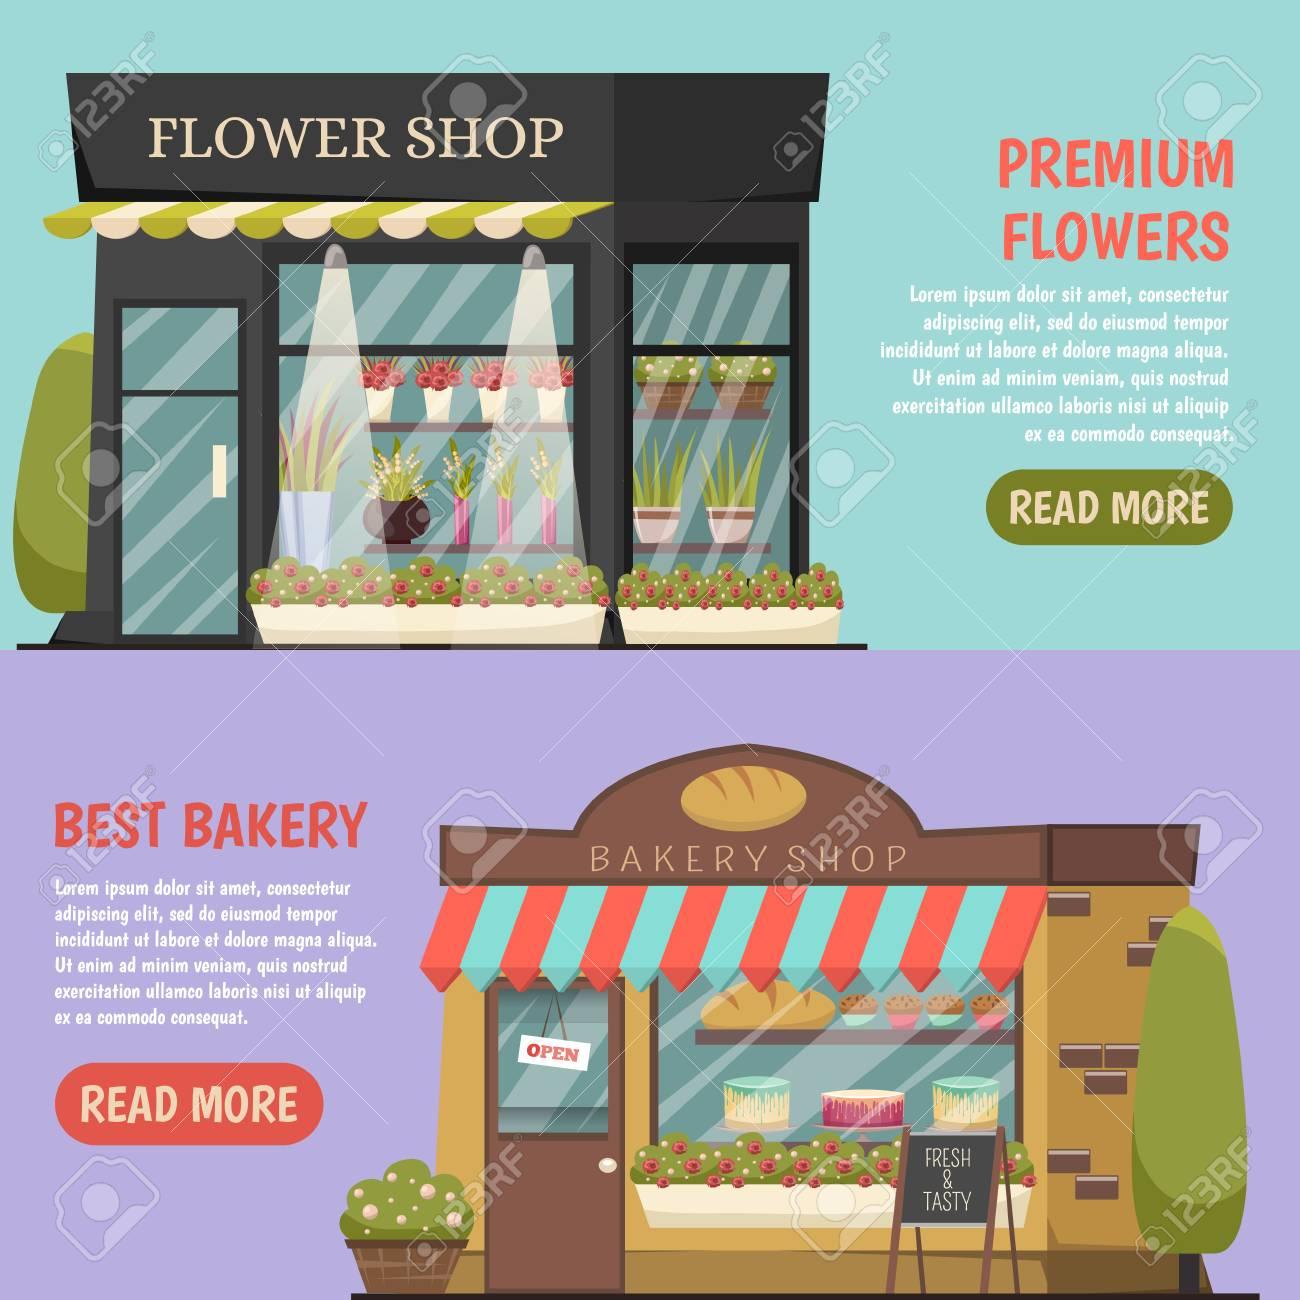 Shops horizontal banners set with flower shop symbols orthogonal isolated vector illustration - 83426549